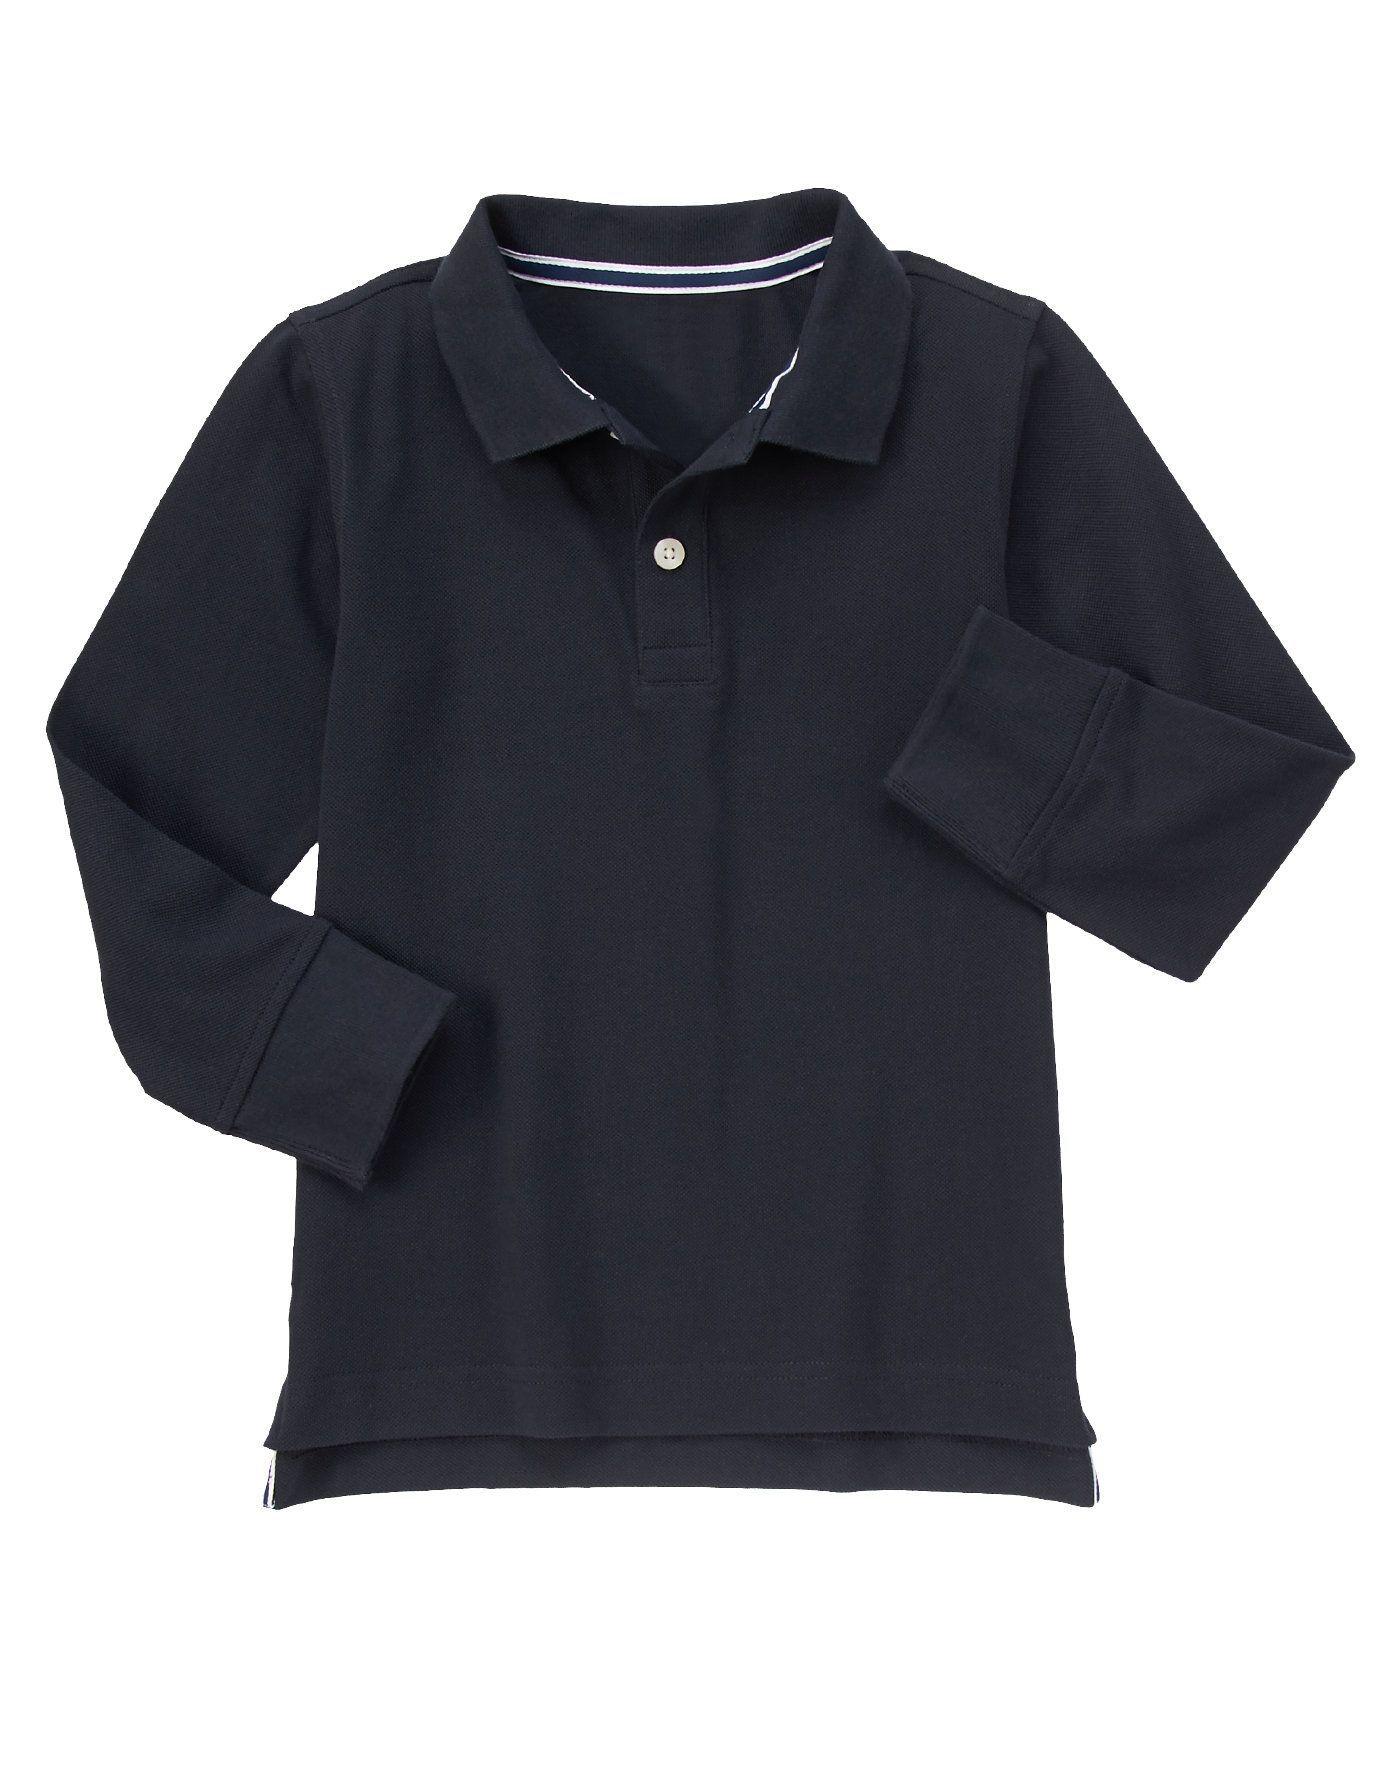 Long Sleeve Polo Shirt At Gymboree Toddlerschooluniforms Toddler